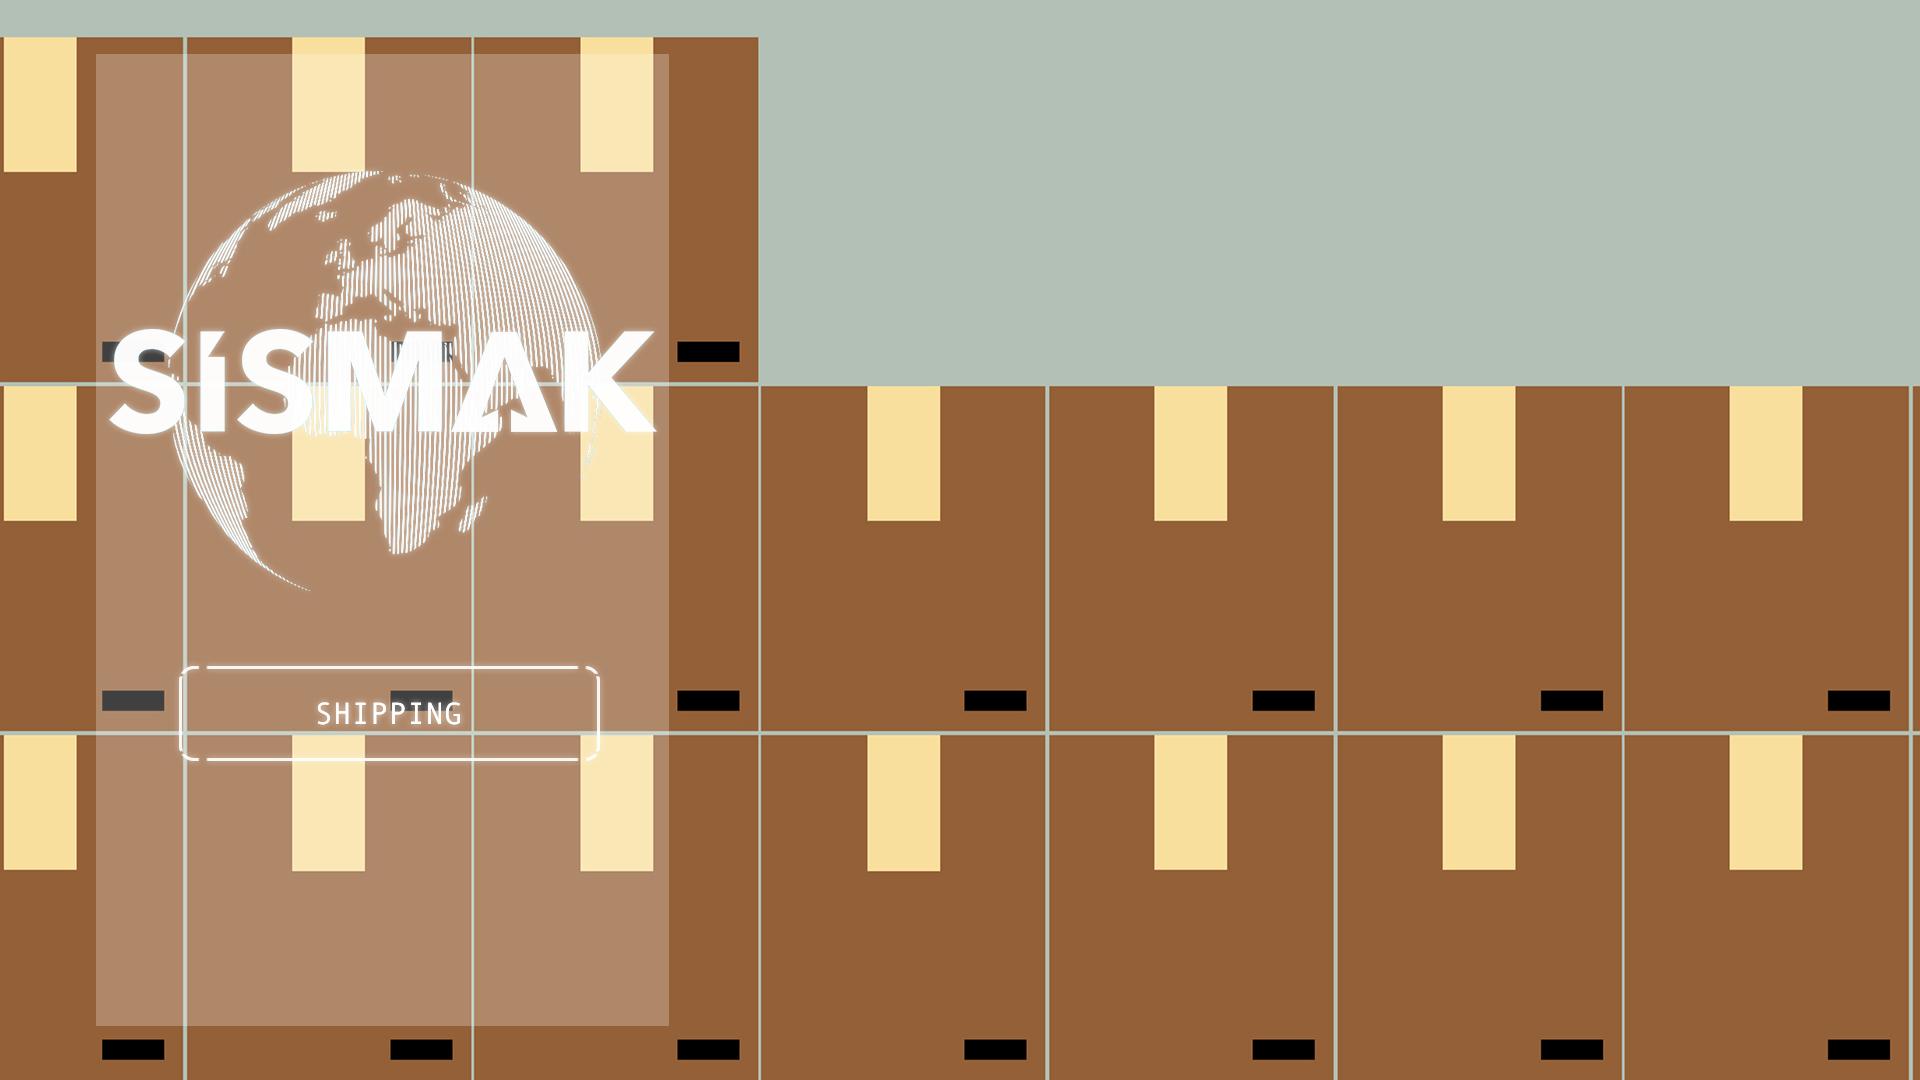 sismak-shipping